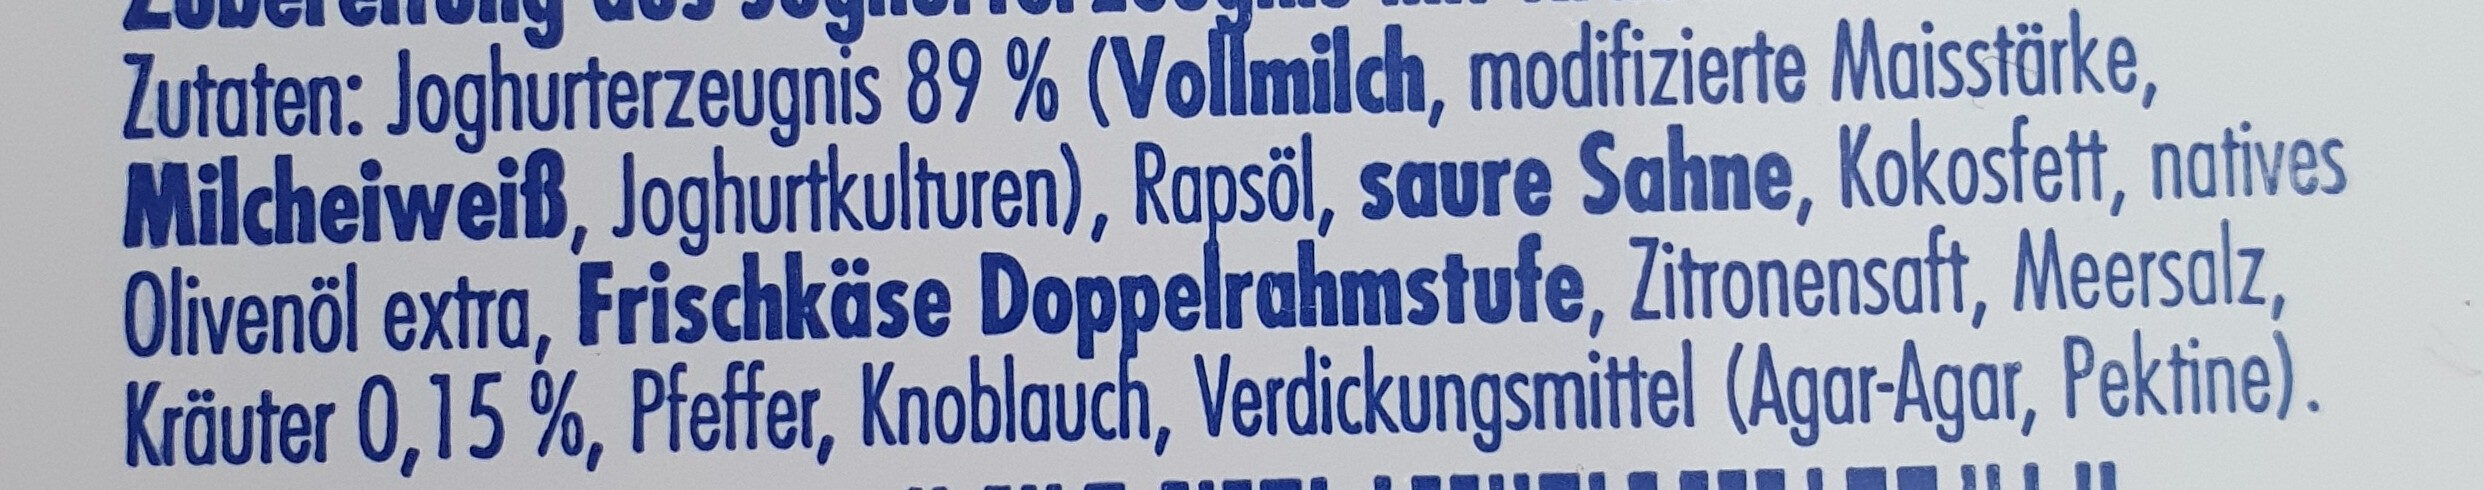 Apostels Sour Cream - Ingrediënten - de